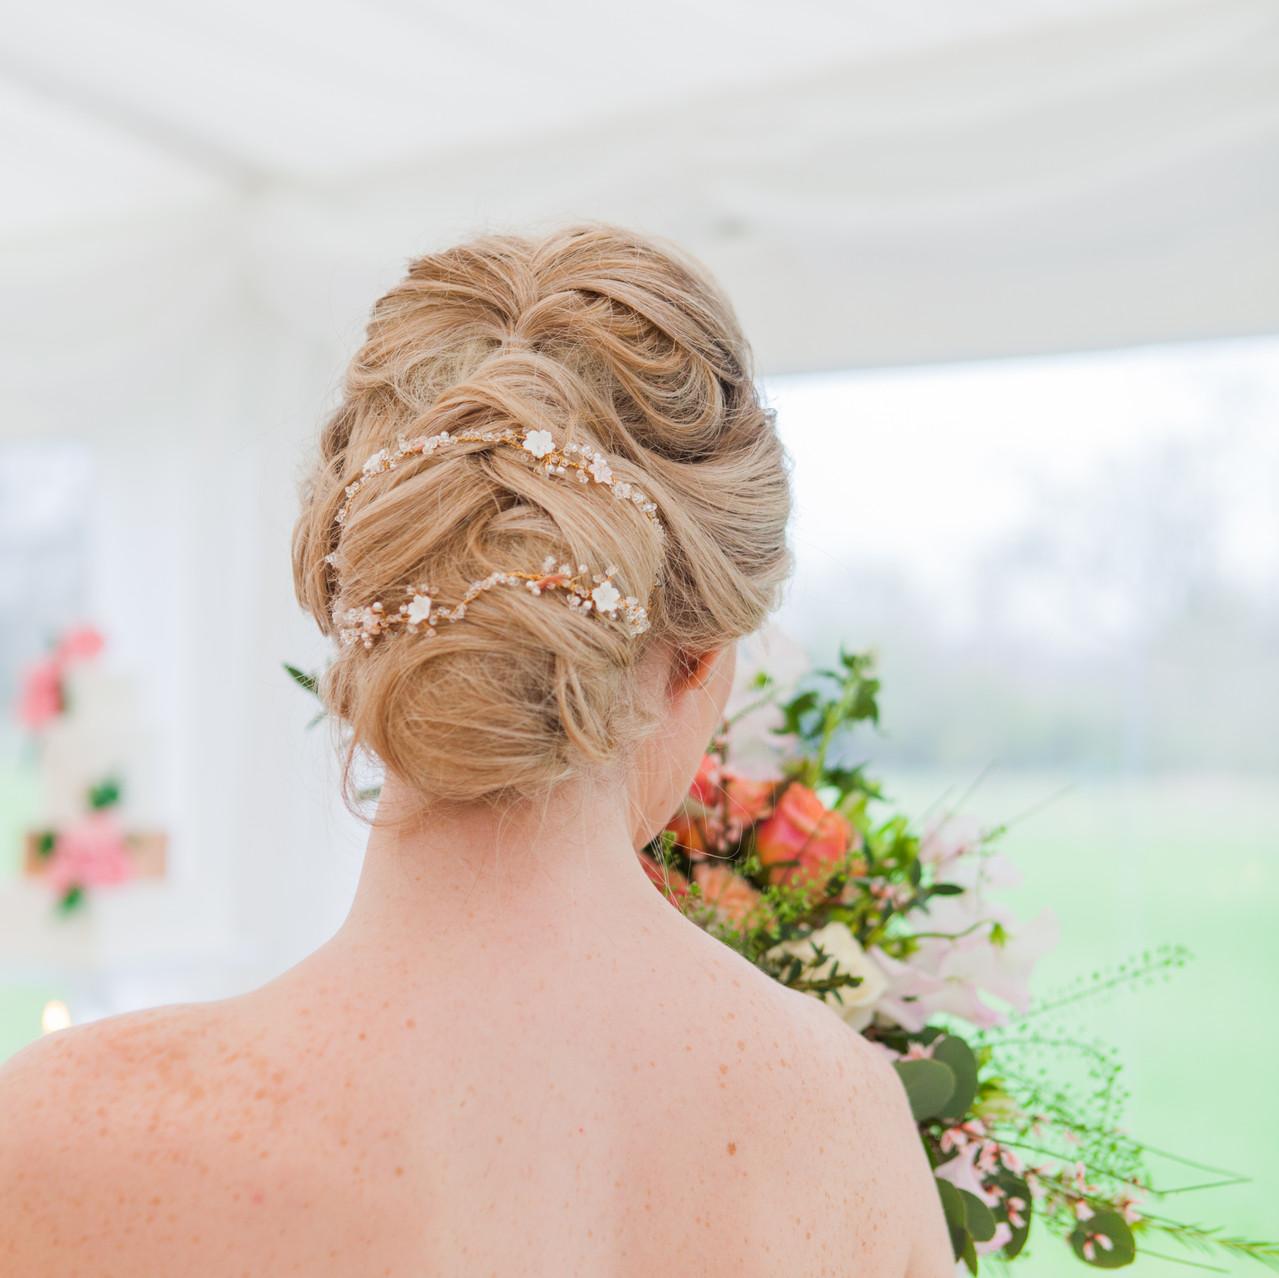 Boho Chic Up Do Wedding Hair